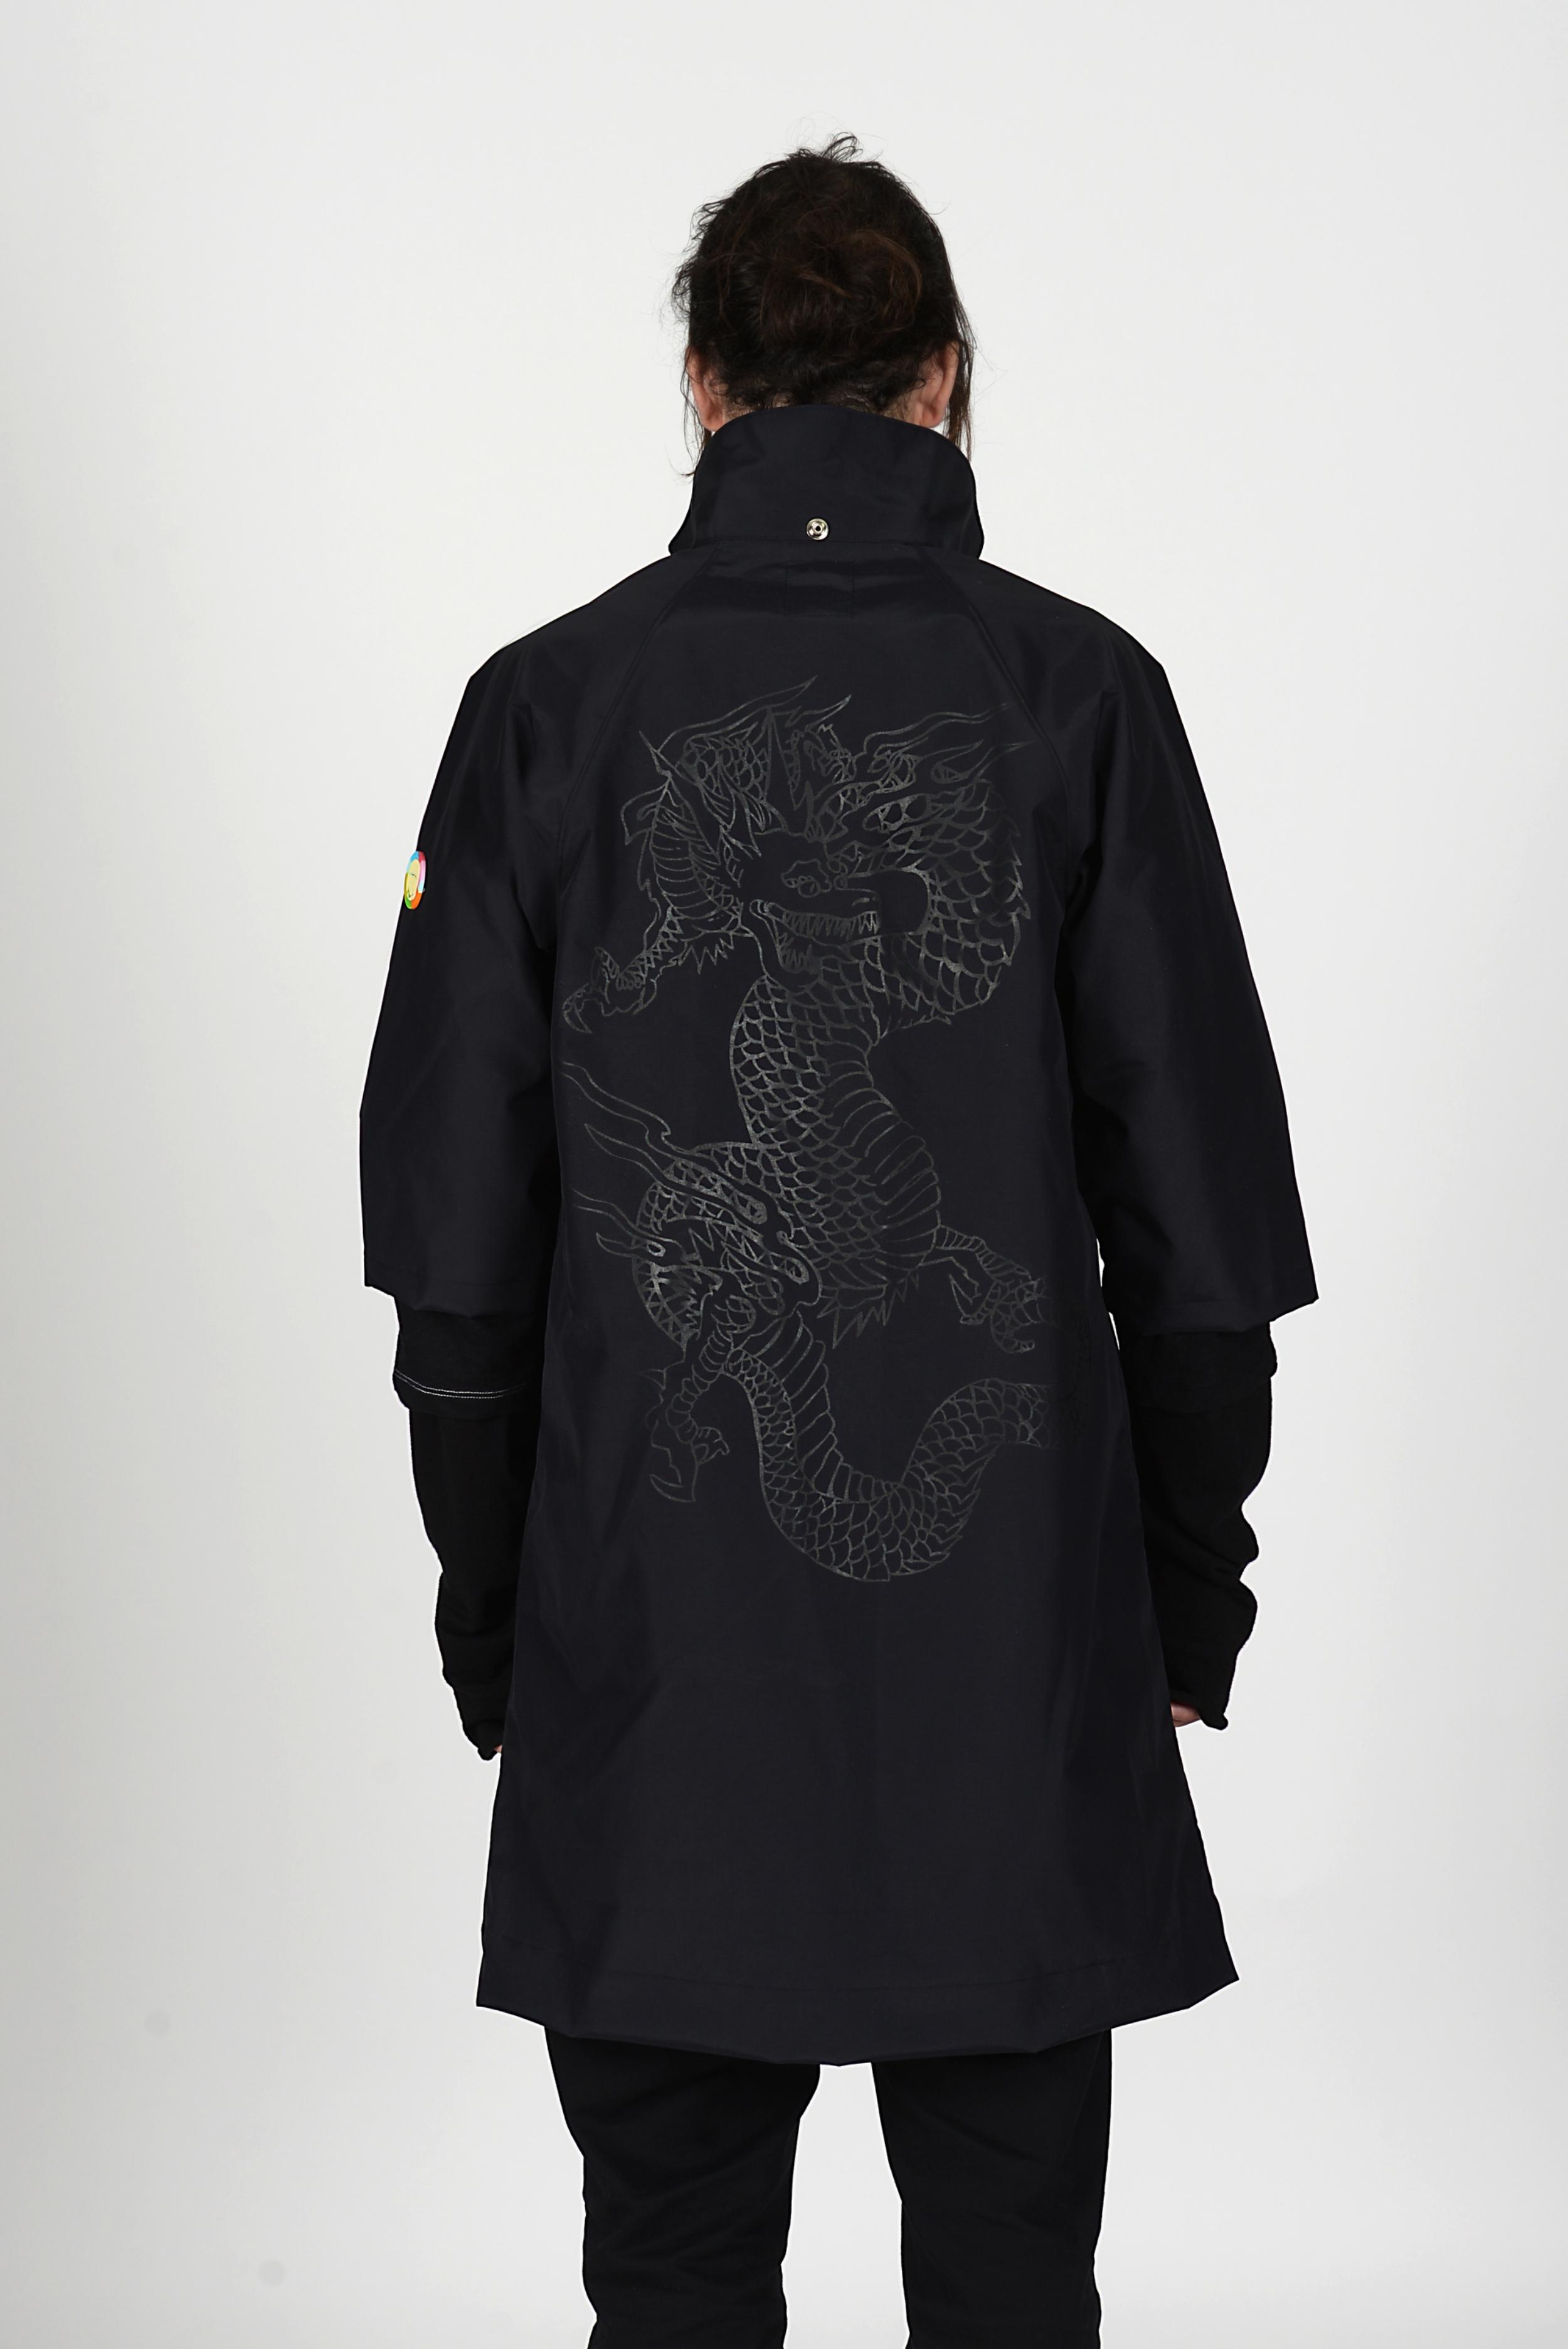 05 Heightened Sense Black Dragon Coat.jpg